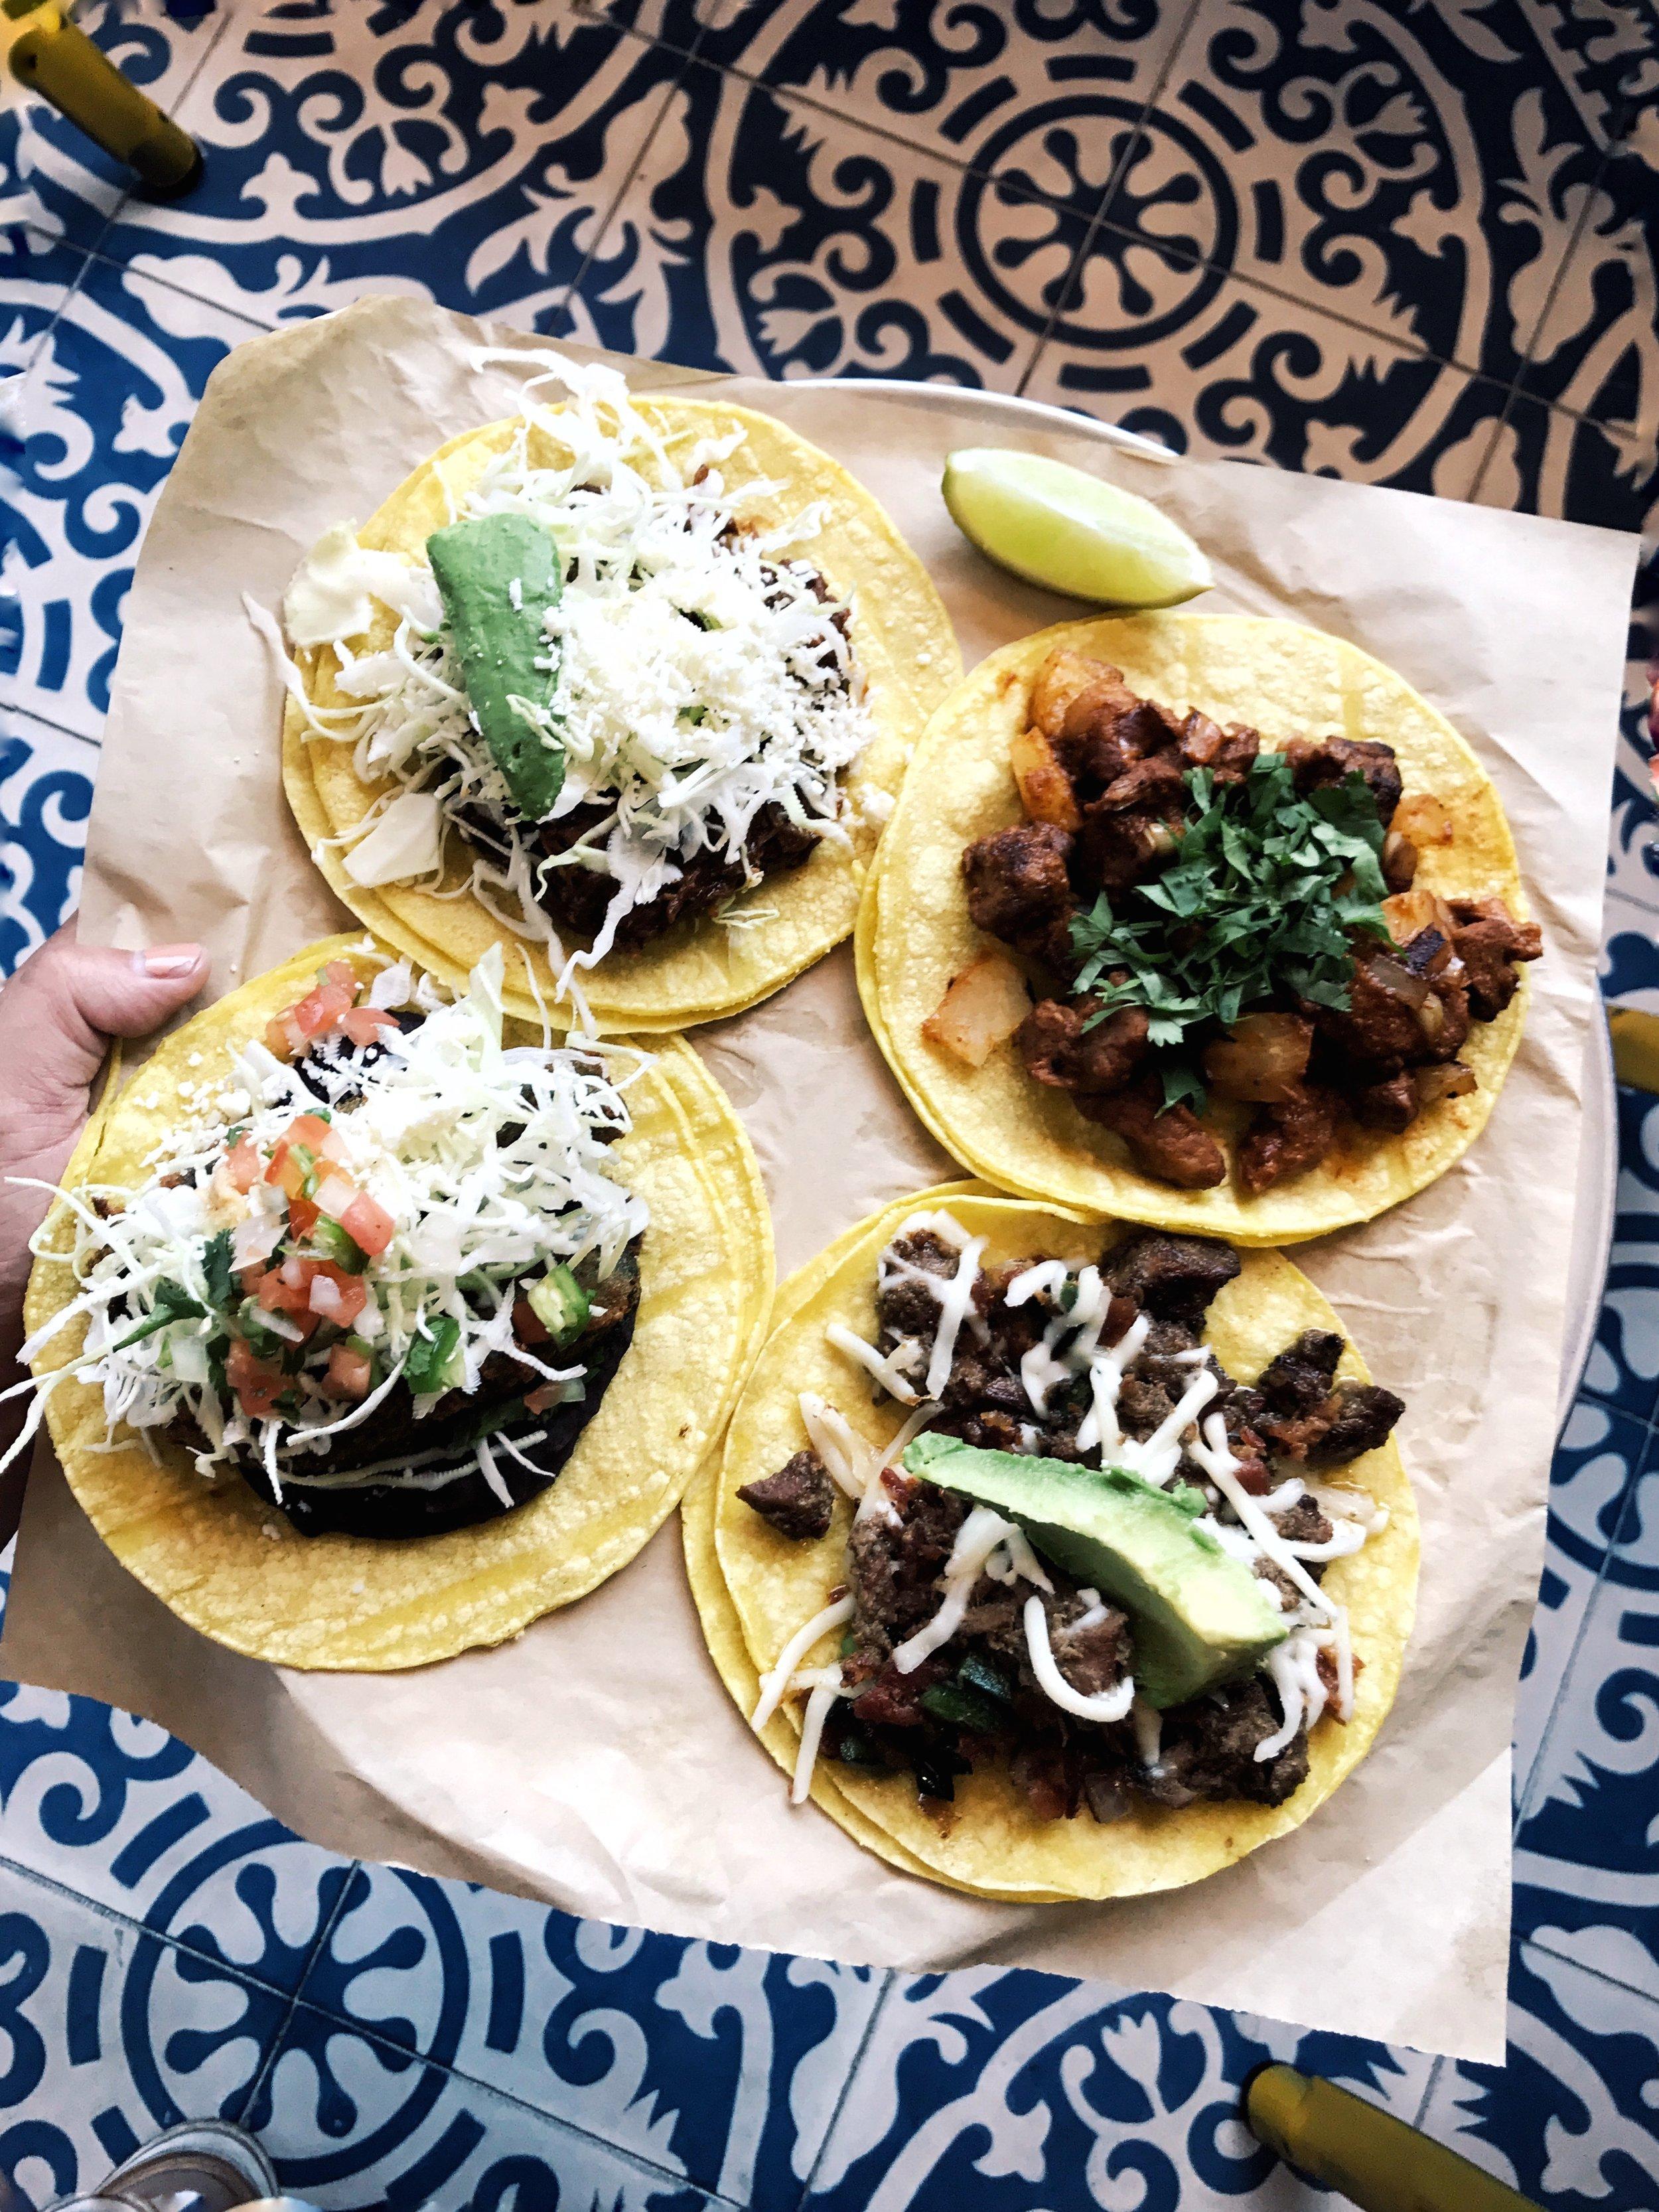 Best Taco Places in Austin, Texas - Papalote Taco House - www.tresgigi.com